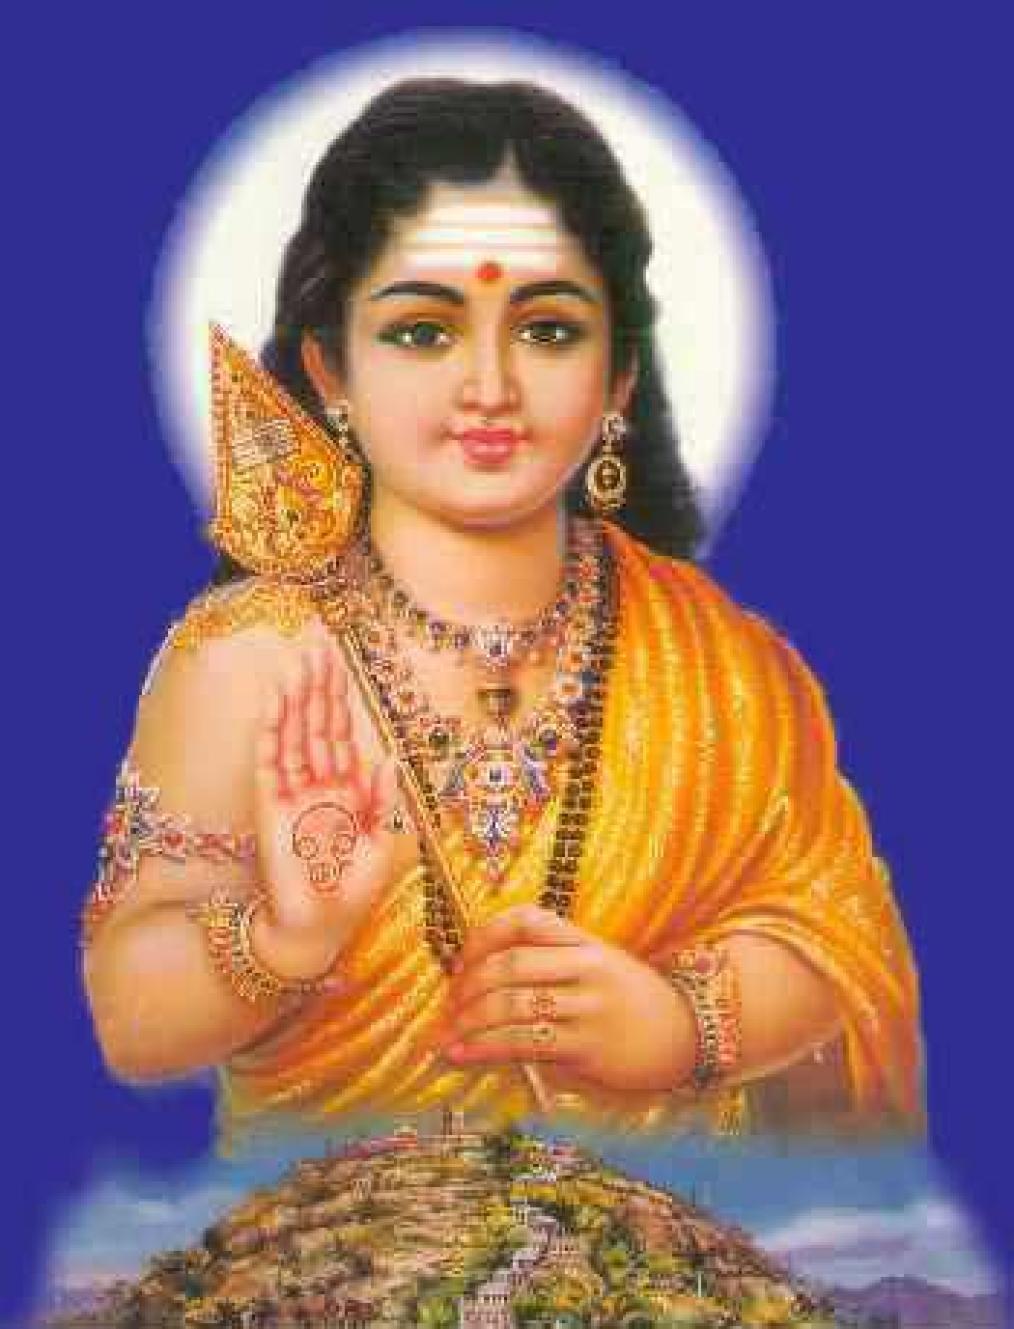 Drpak muniraj academy hindu god wallpapers for desktop free drpak muniraj academy hindu god wallpapers for desktop free download thecheapjerseys Images